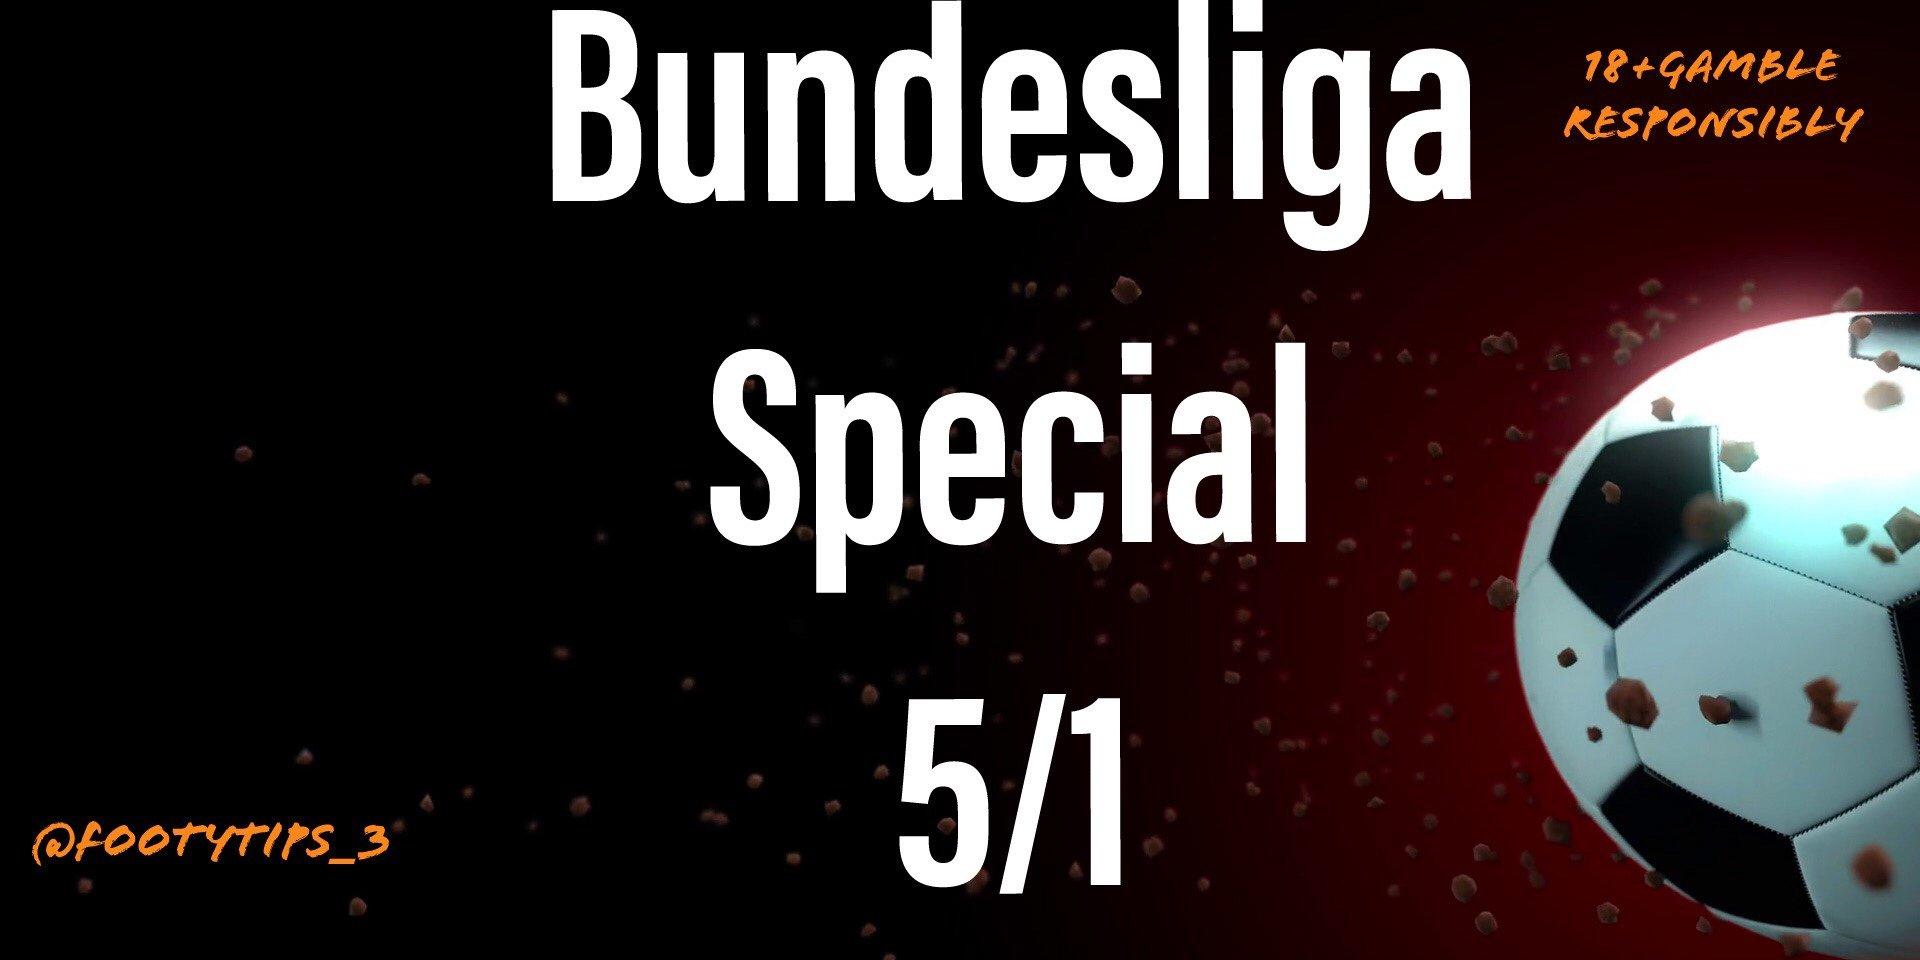 Bundesliga Special Football Tip For 13/06/29